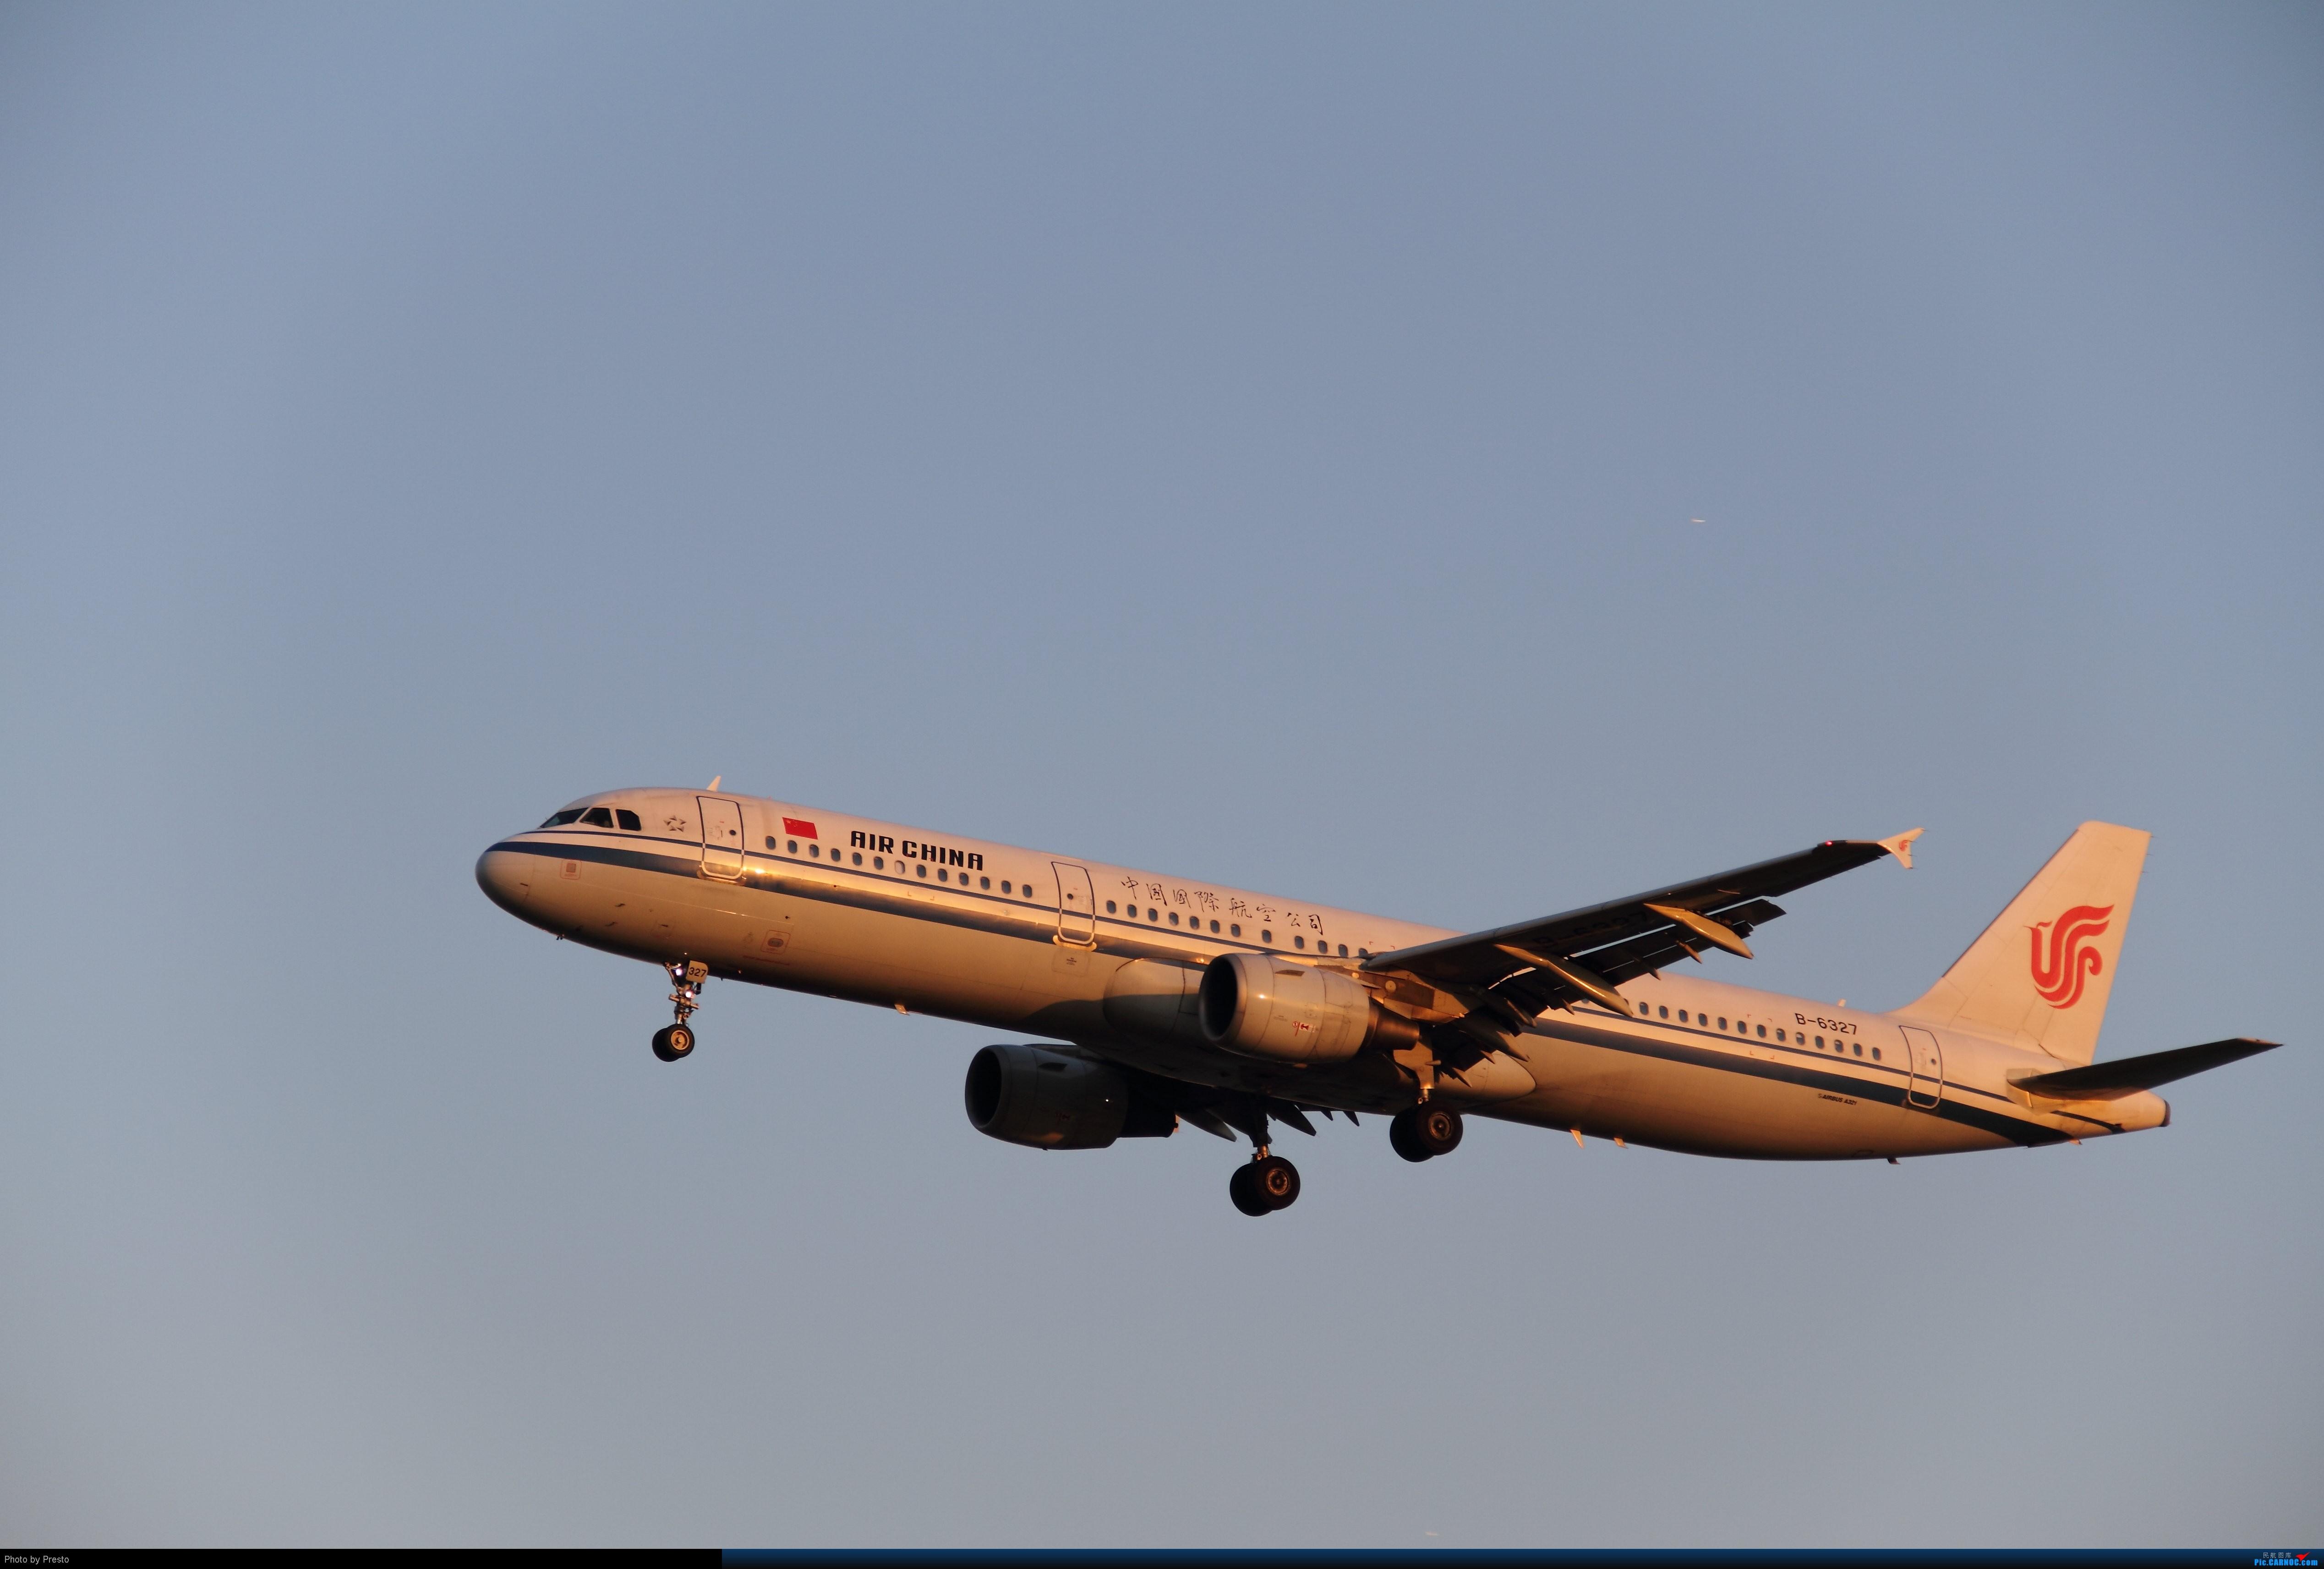 Re:[原创]2.2PEK 首次发图 虚心求教 AIRBUS A321-200 B-6327 中国北京首都机场